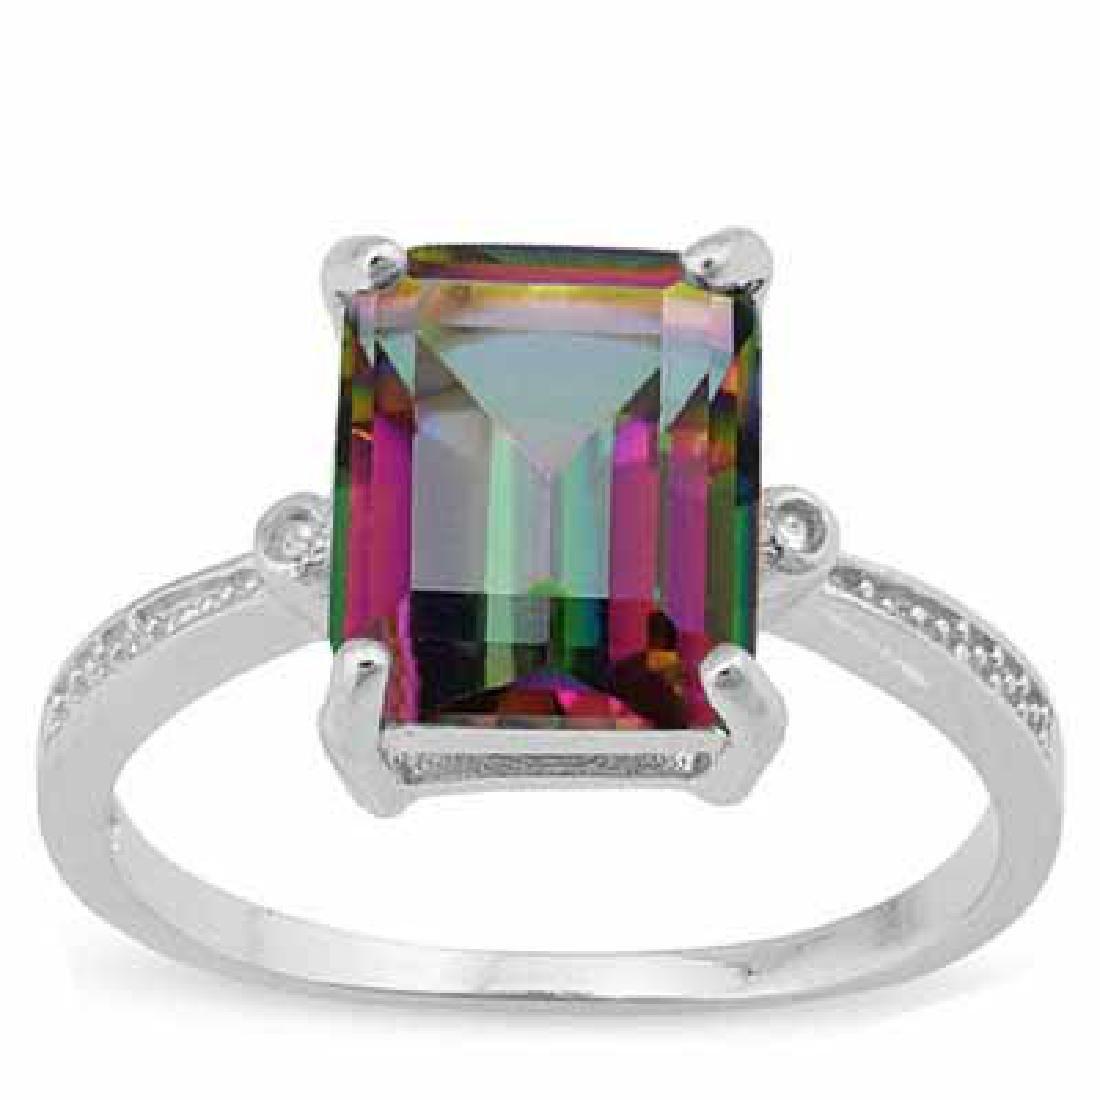 3 CARAT MYSTIC GEMSTONE & DIAMOND 925 STERLING SILVER R